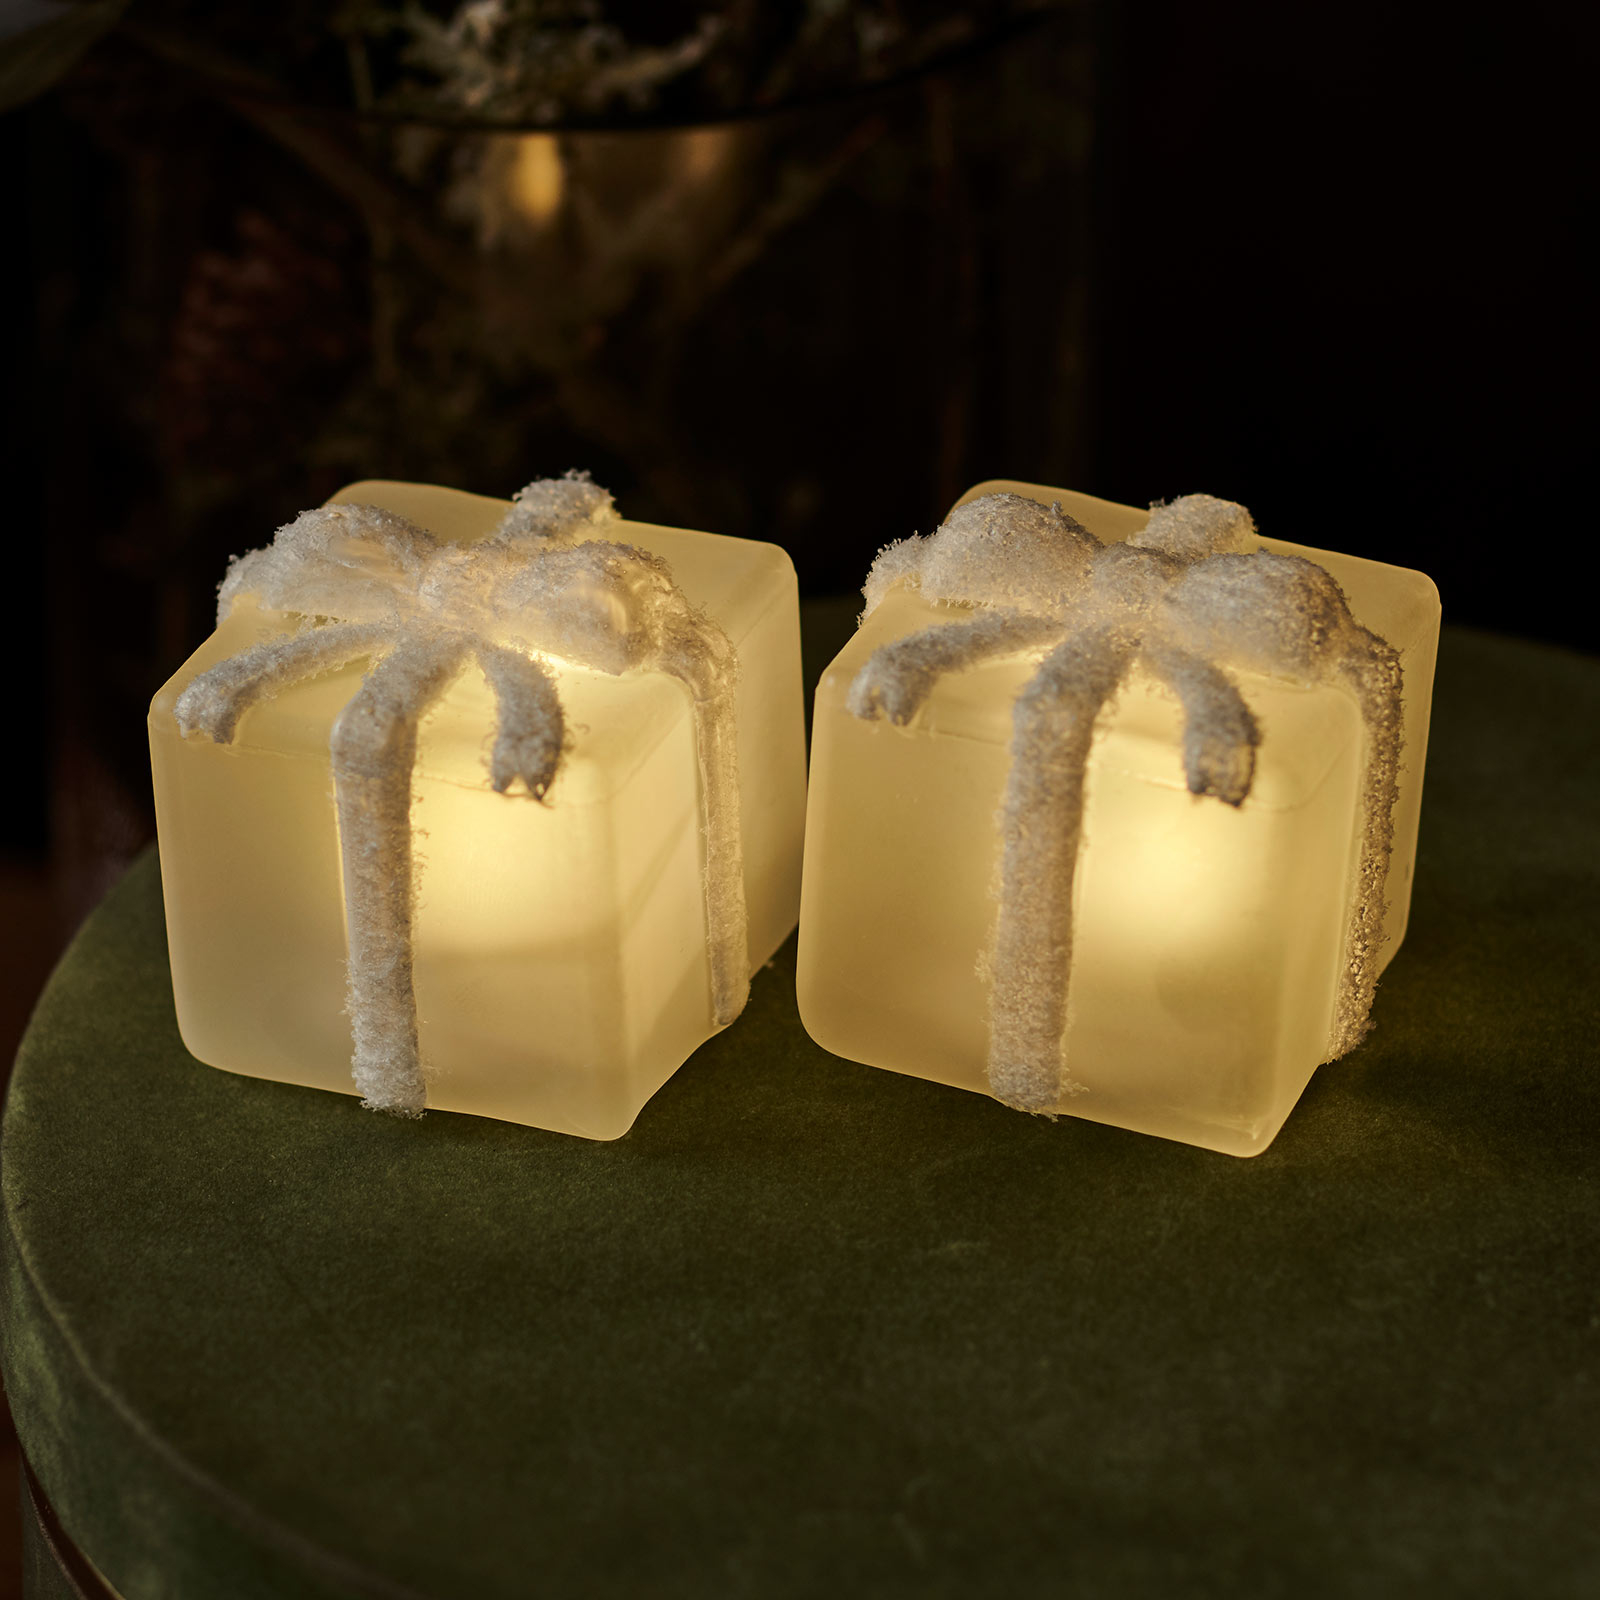 LED sfeerlamp Santa cadeaus 2 per set